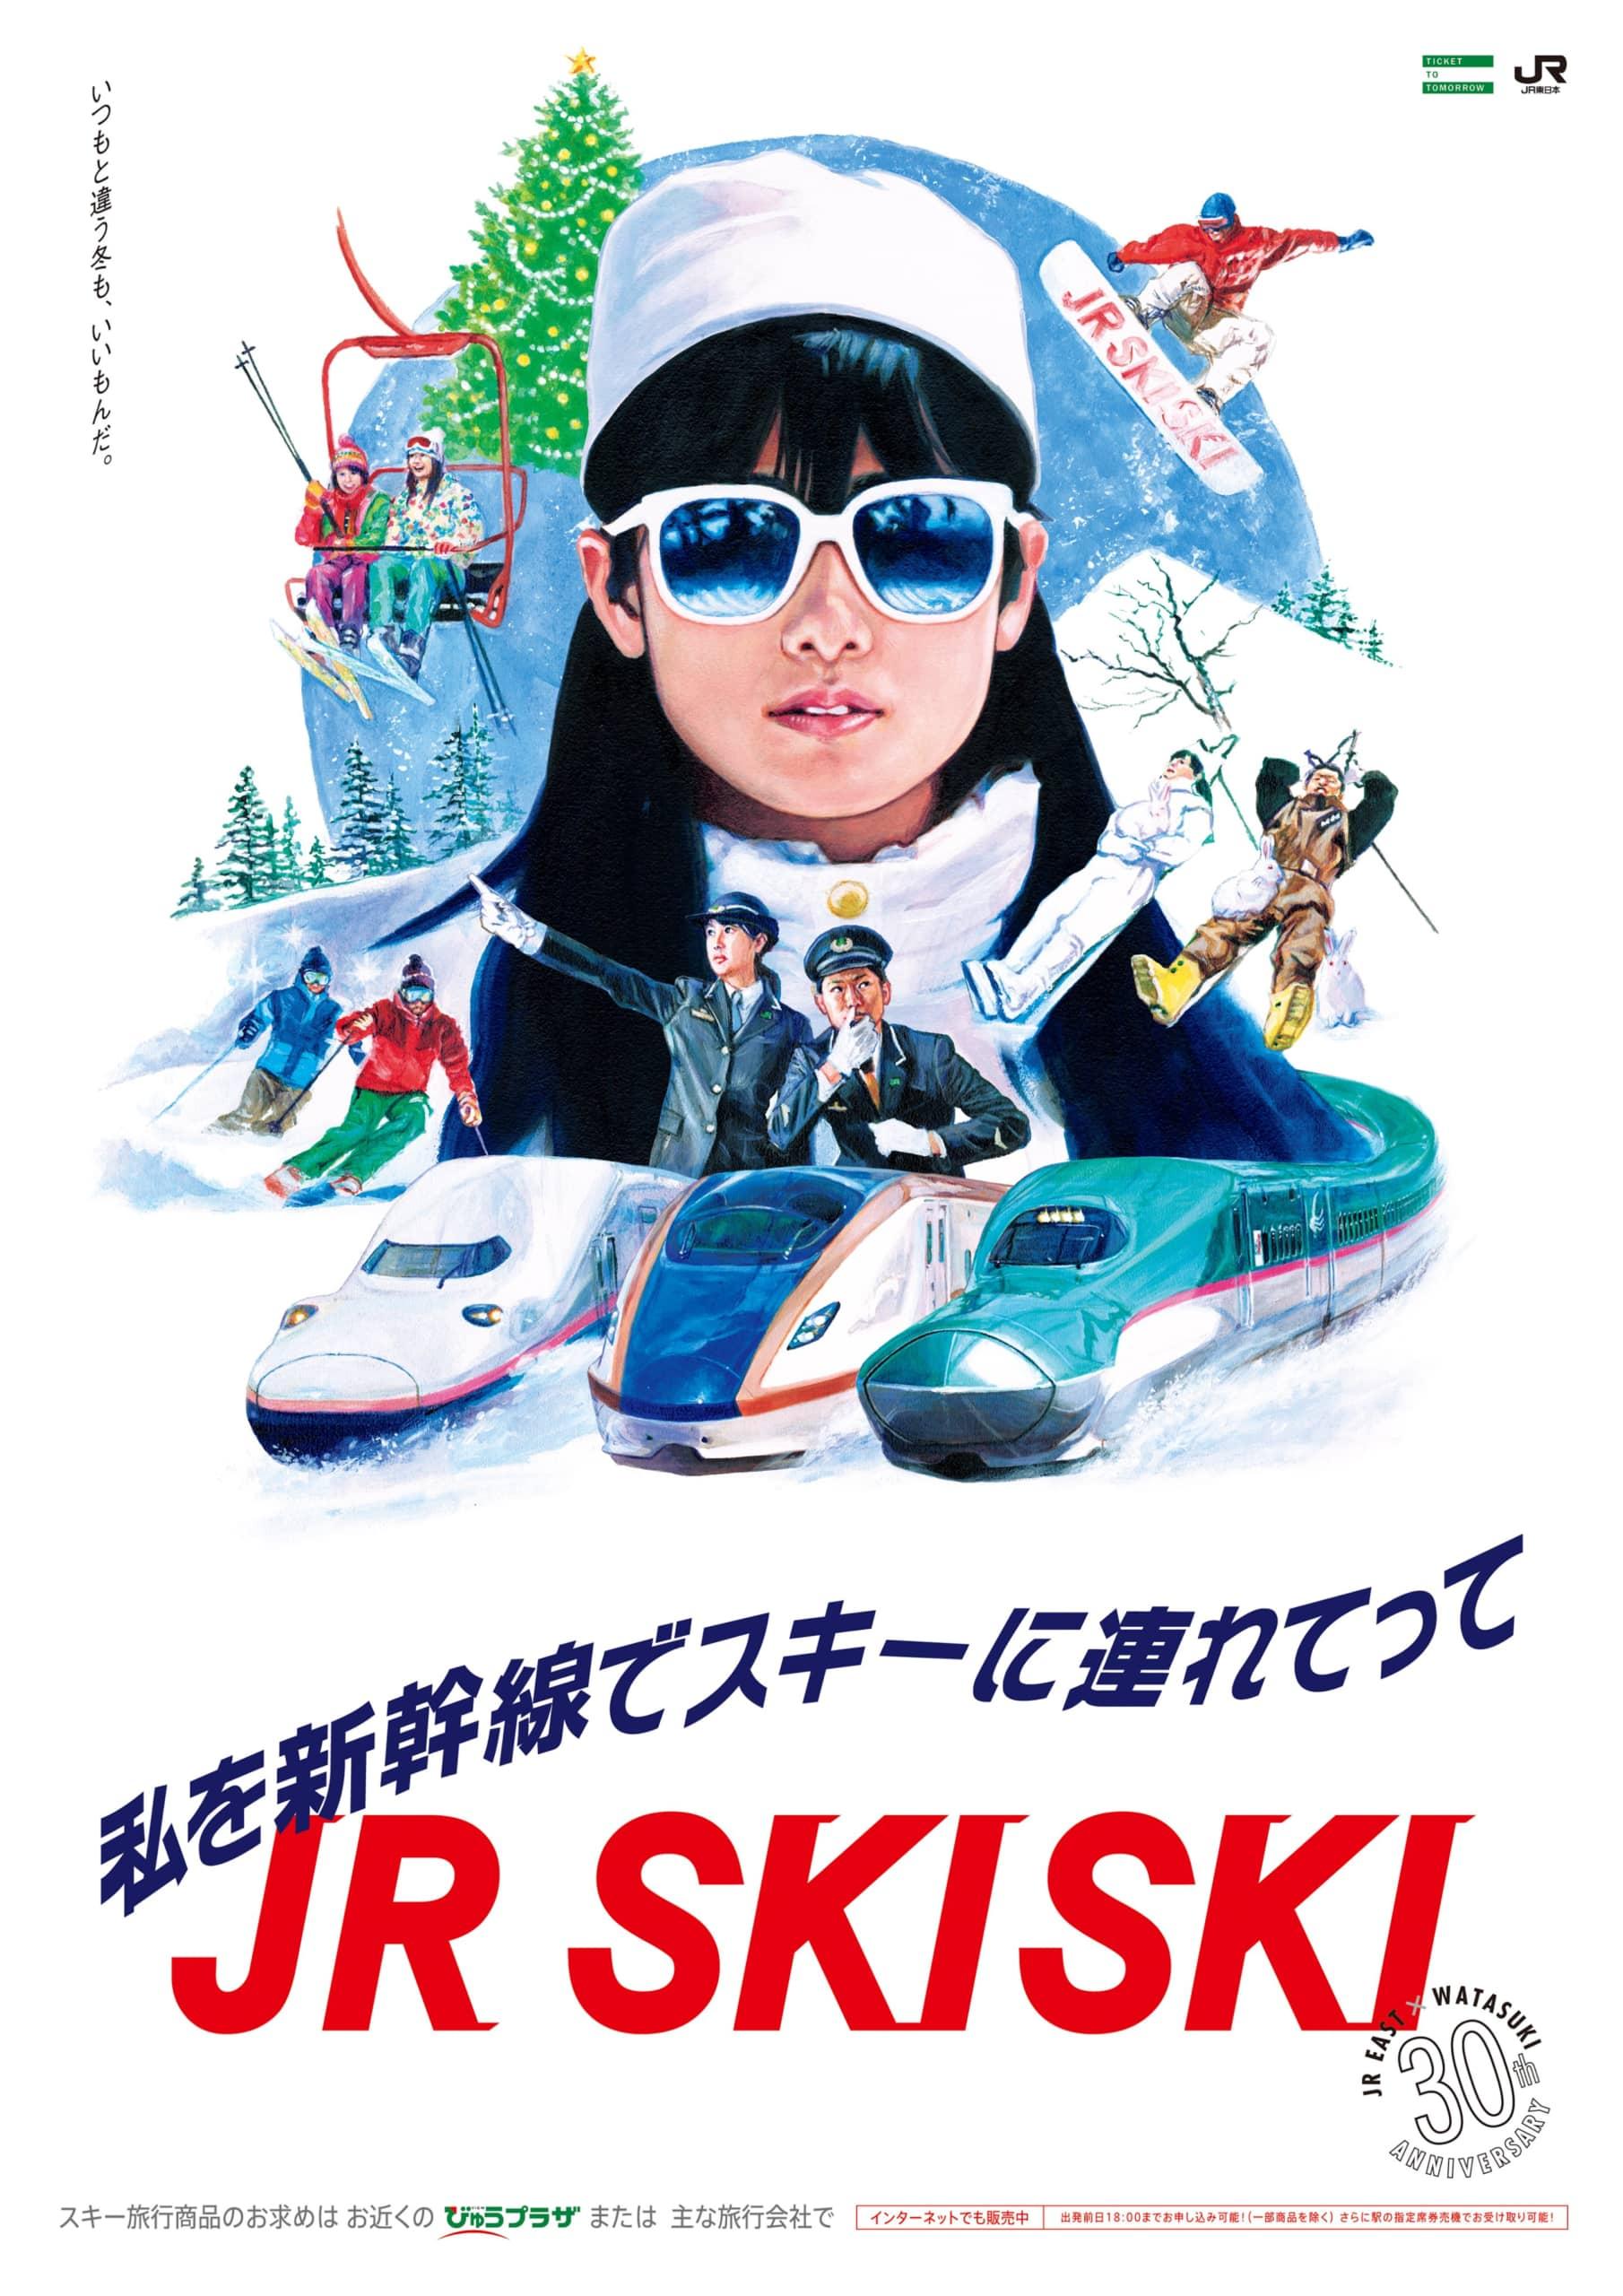 「JR SKISKI(JRスキーキャンペーン)のCMガール」で好きなのは誰?【本田翼、広瀬すずなど / 人気投票実施中】 | ねとらぼ調査隊